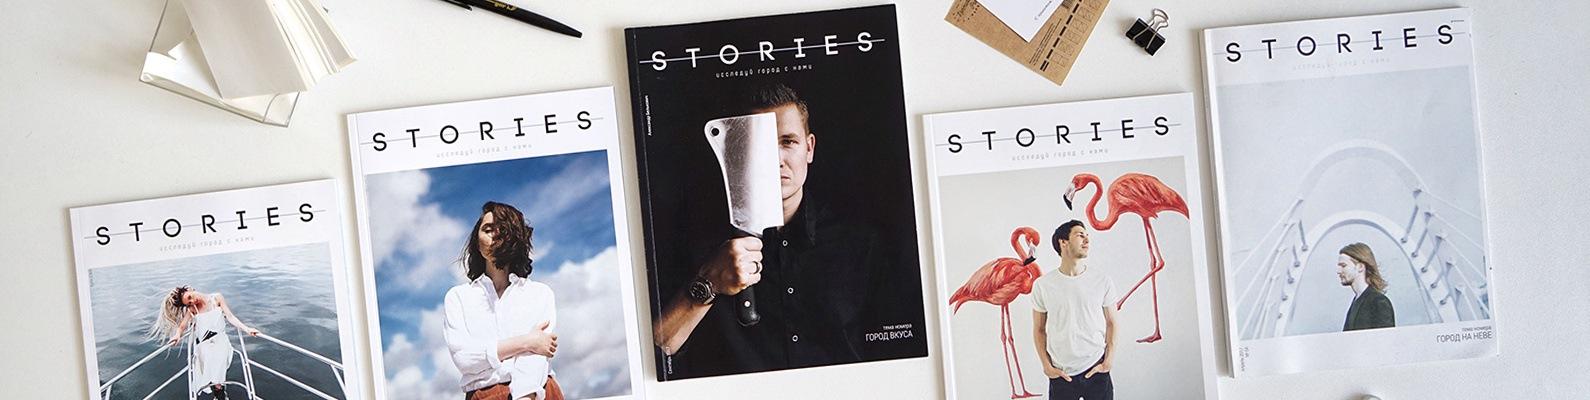 bbebd4d02b64 Stories Magazine   ВКонтакте